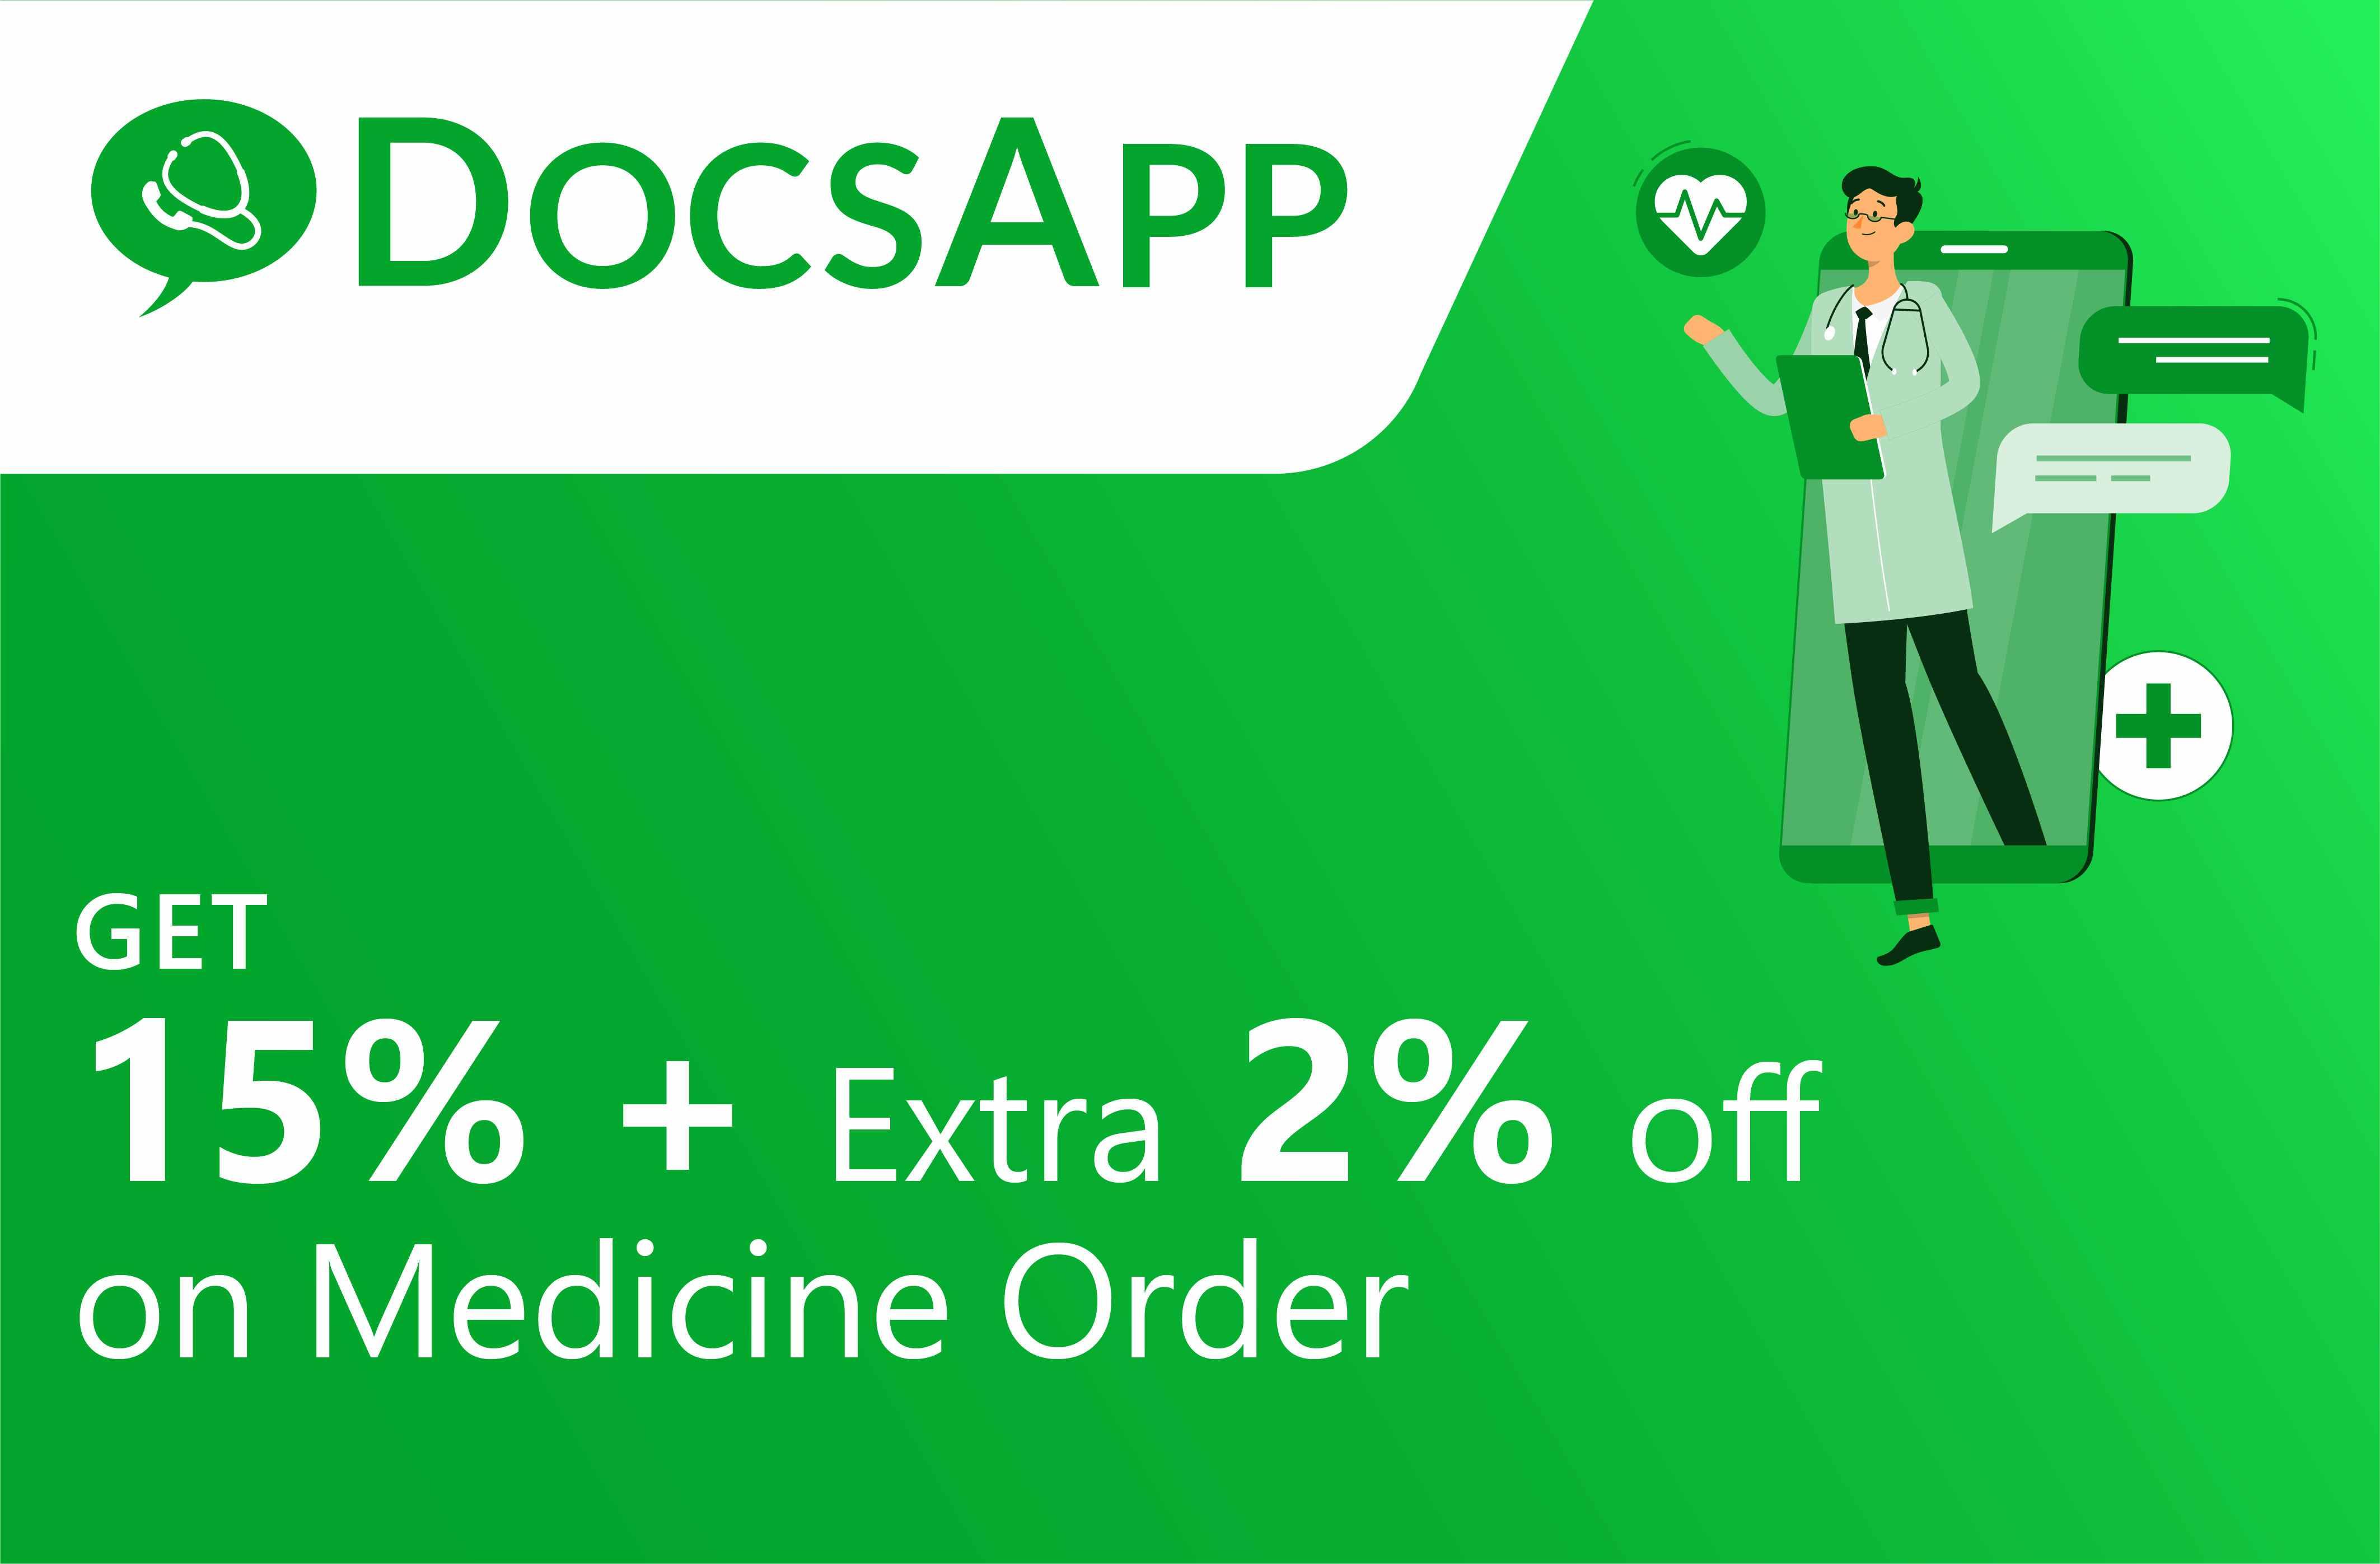 Upto 17% off on Medicine Orders